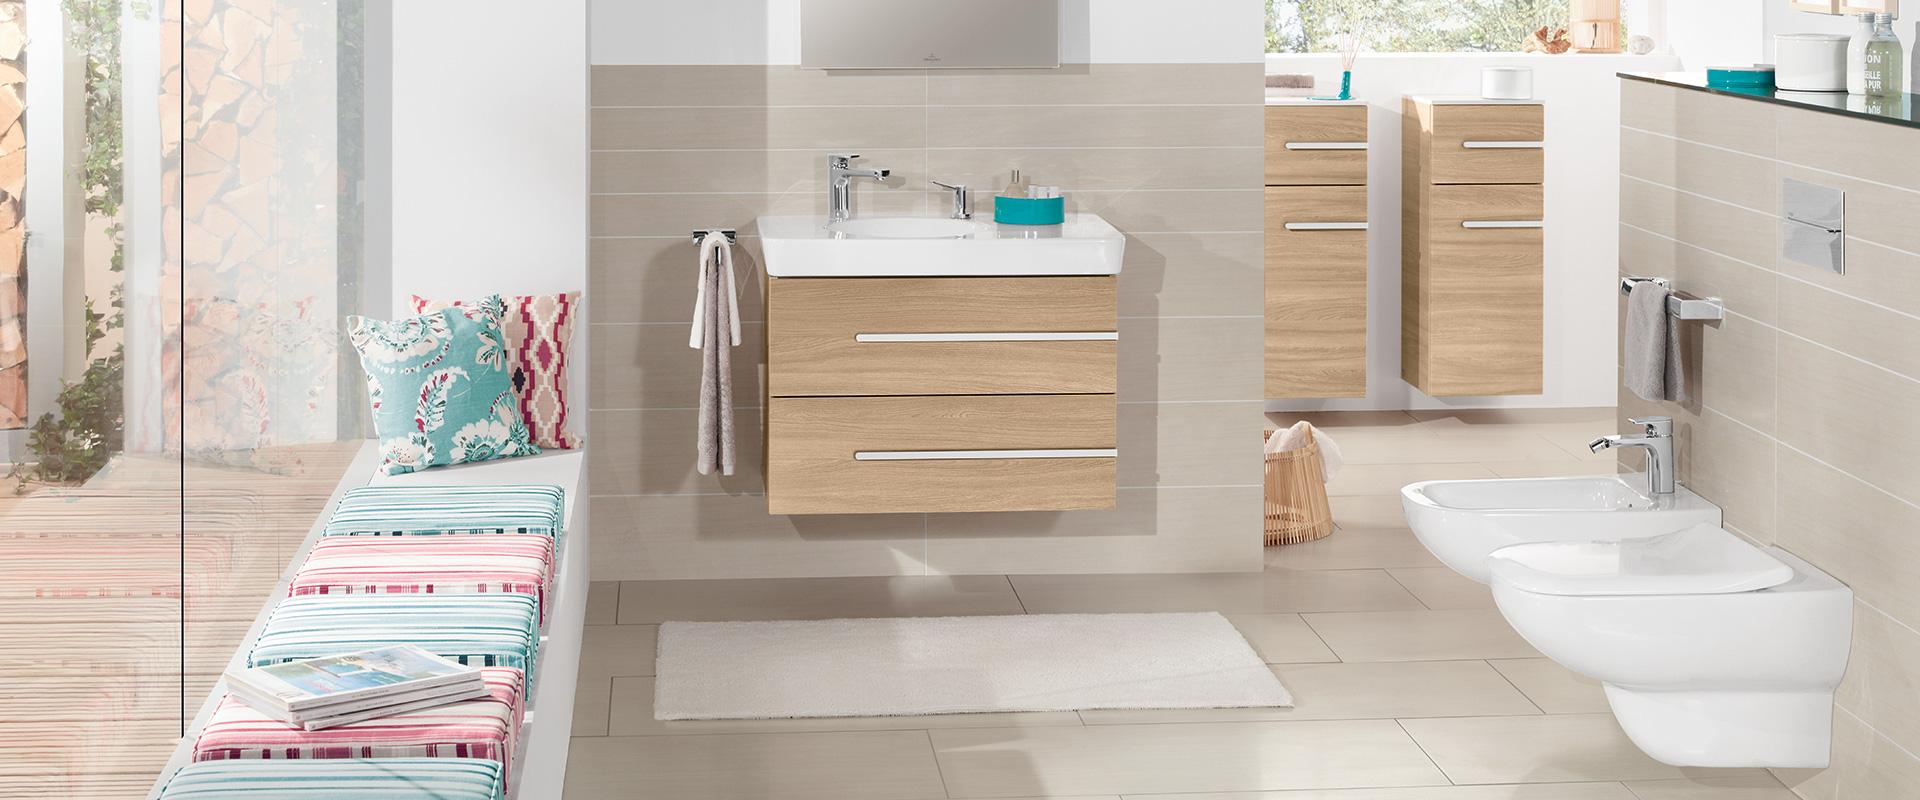 kollektion joyce von villeroy boch immer neu immer anders immer joyce. Black Bedroom Furniture Sets. Home Design Ideas